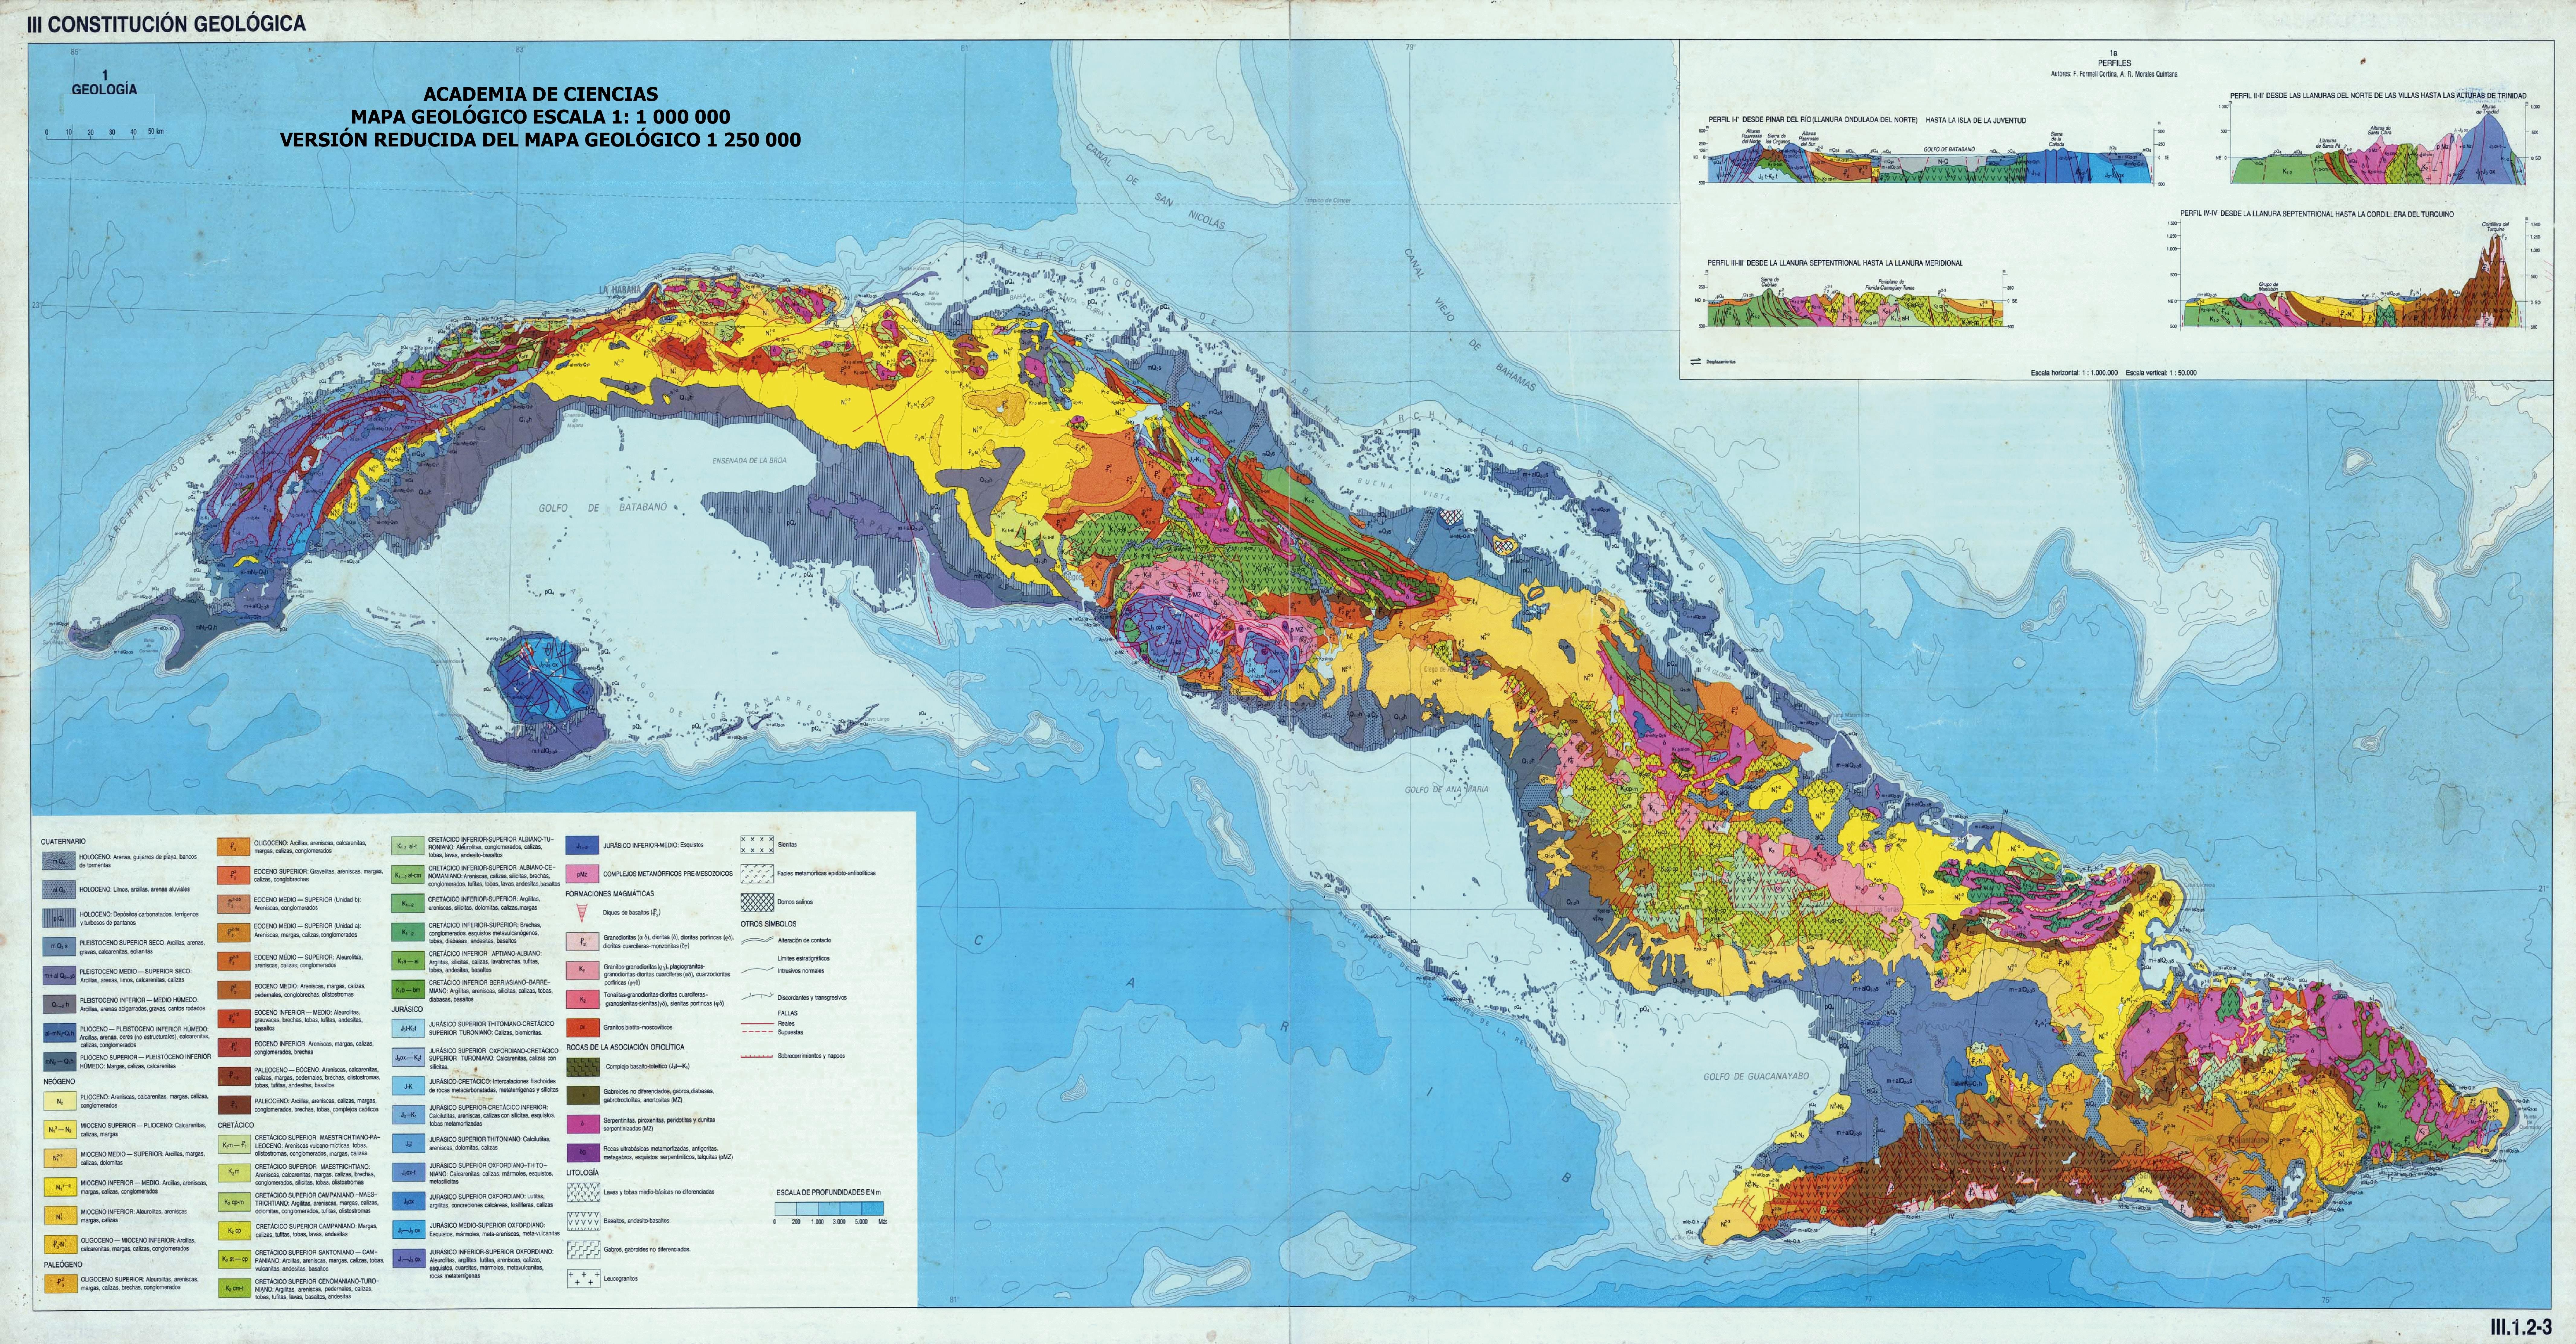 Biblioteca Digital Cubana de Geociencias